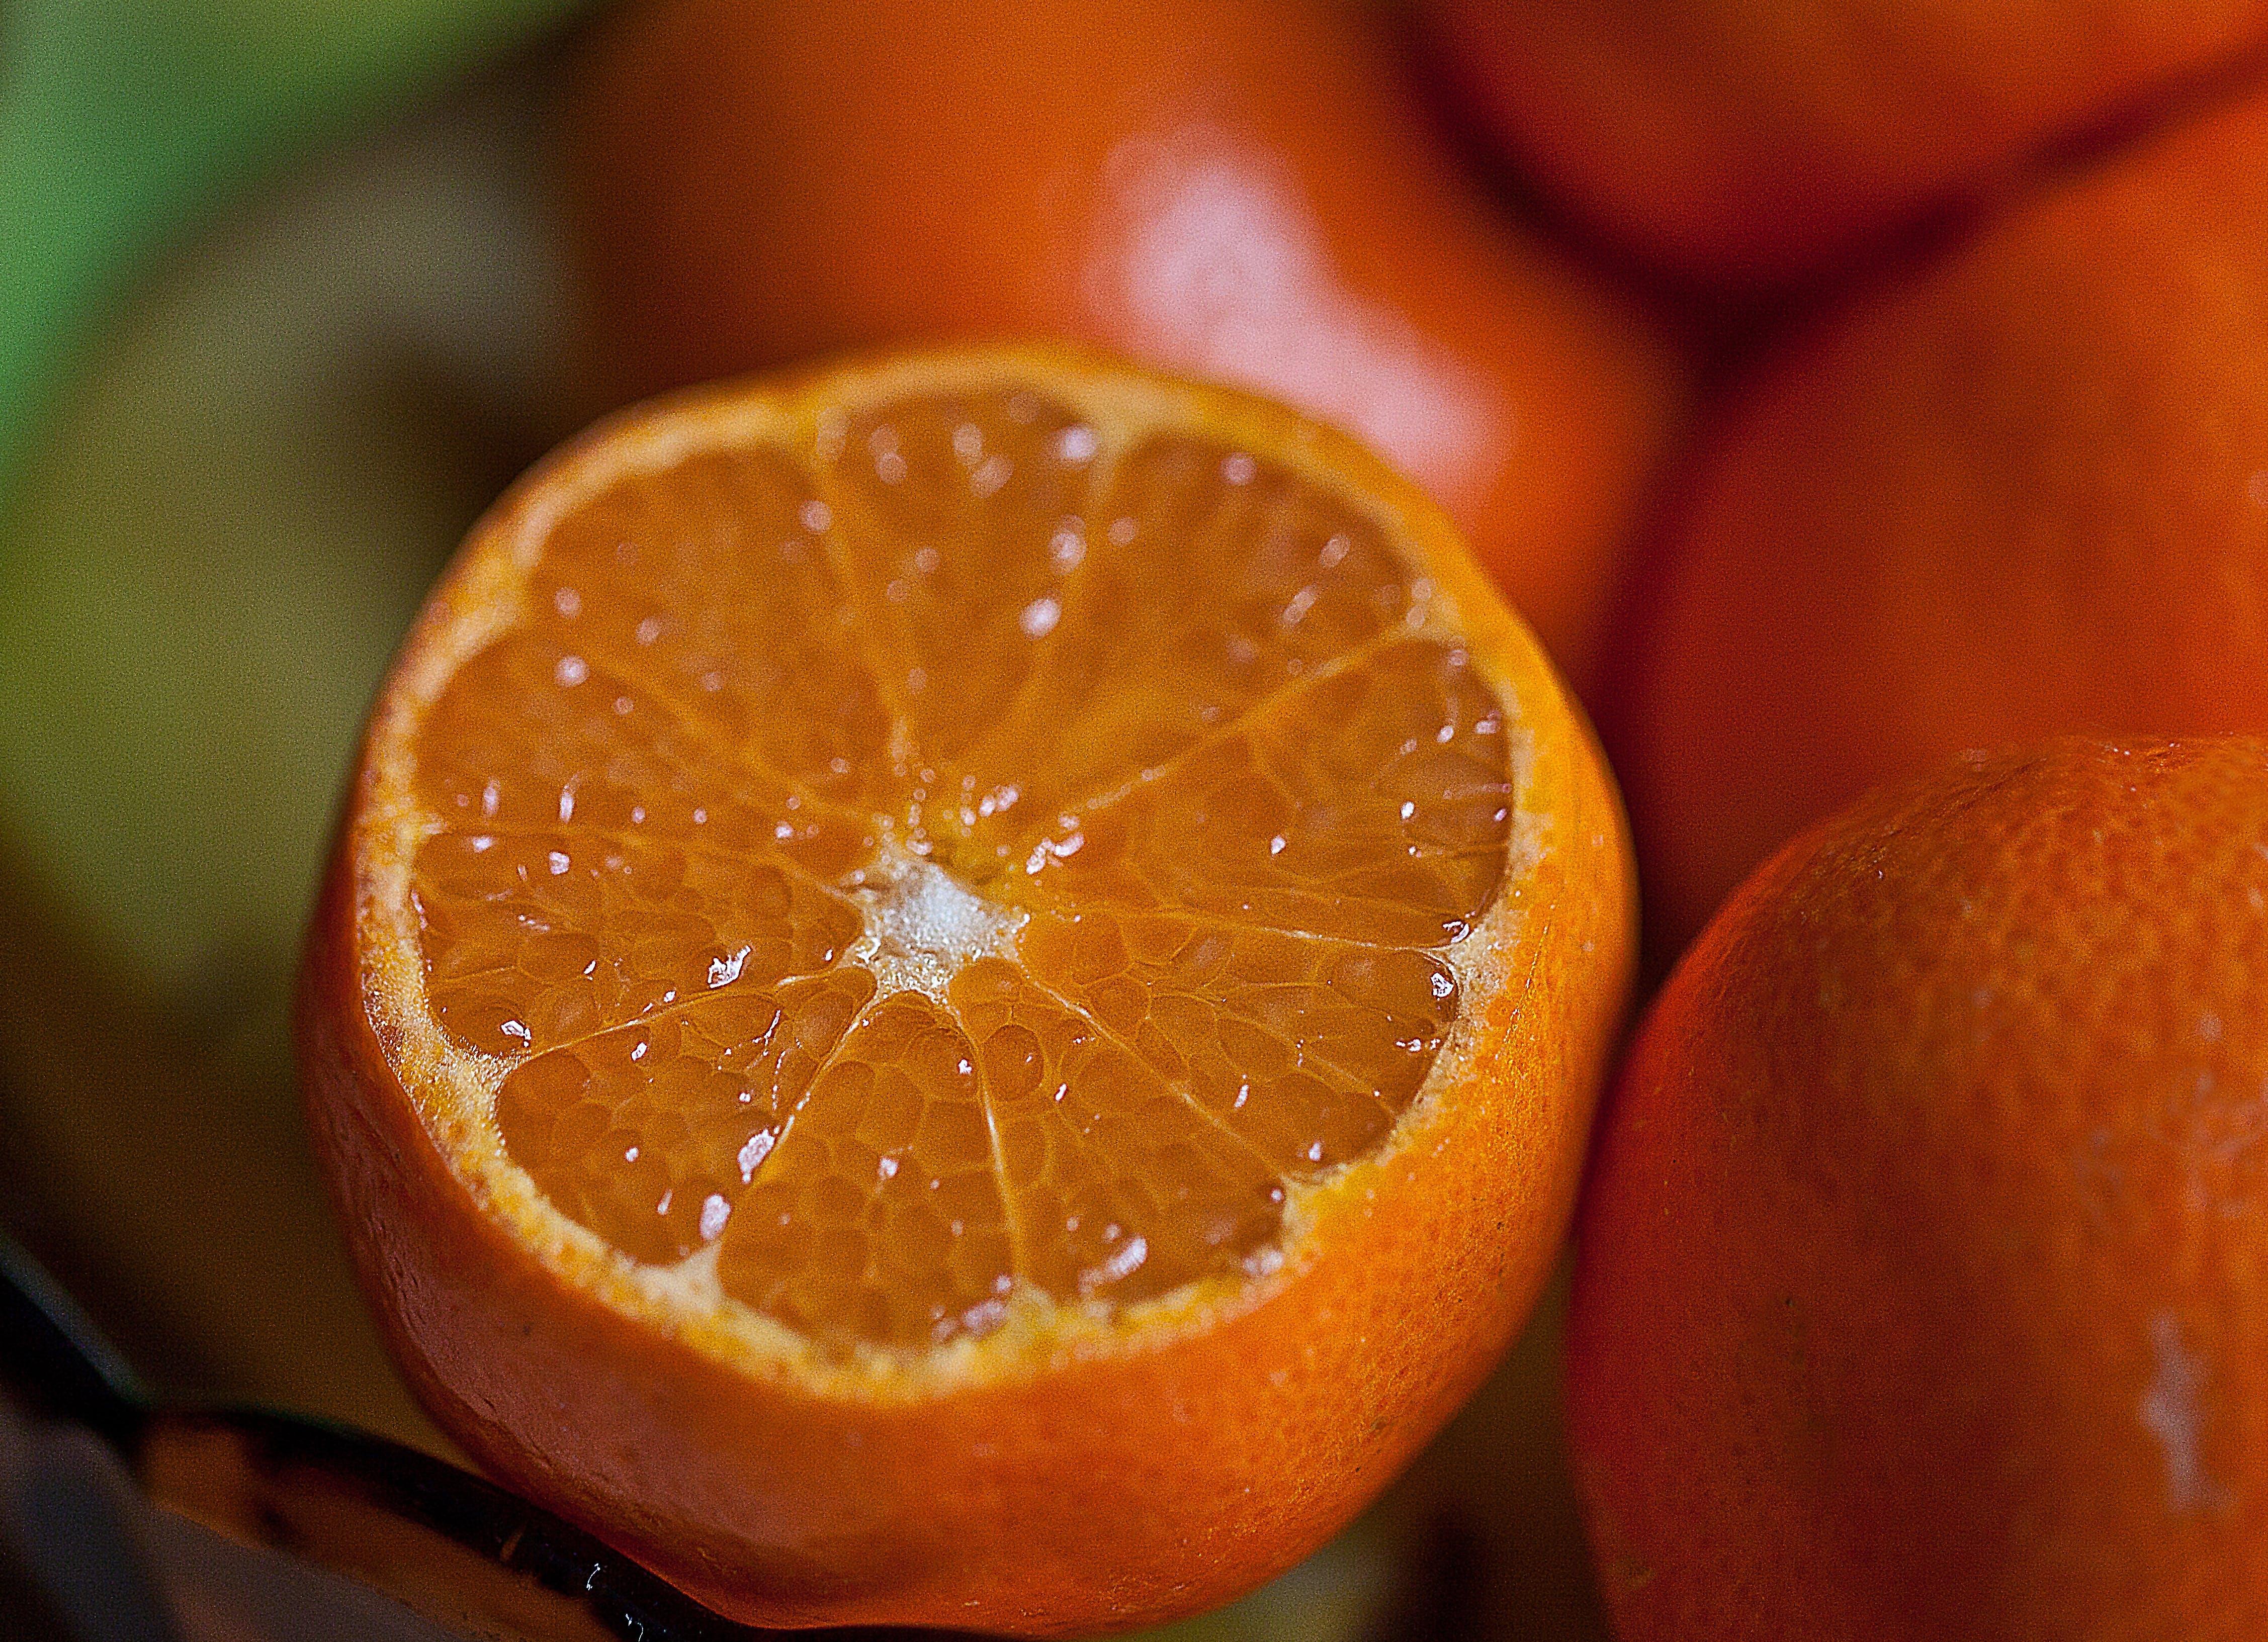 Orange Fruit Selective Focus Photography